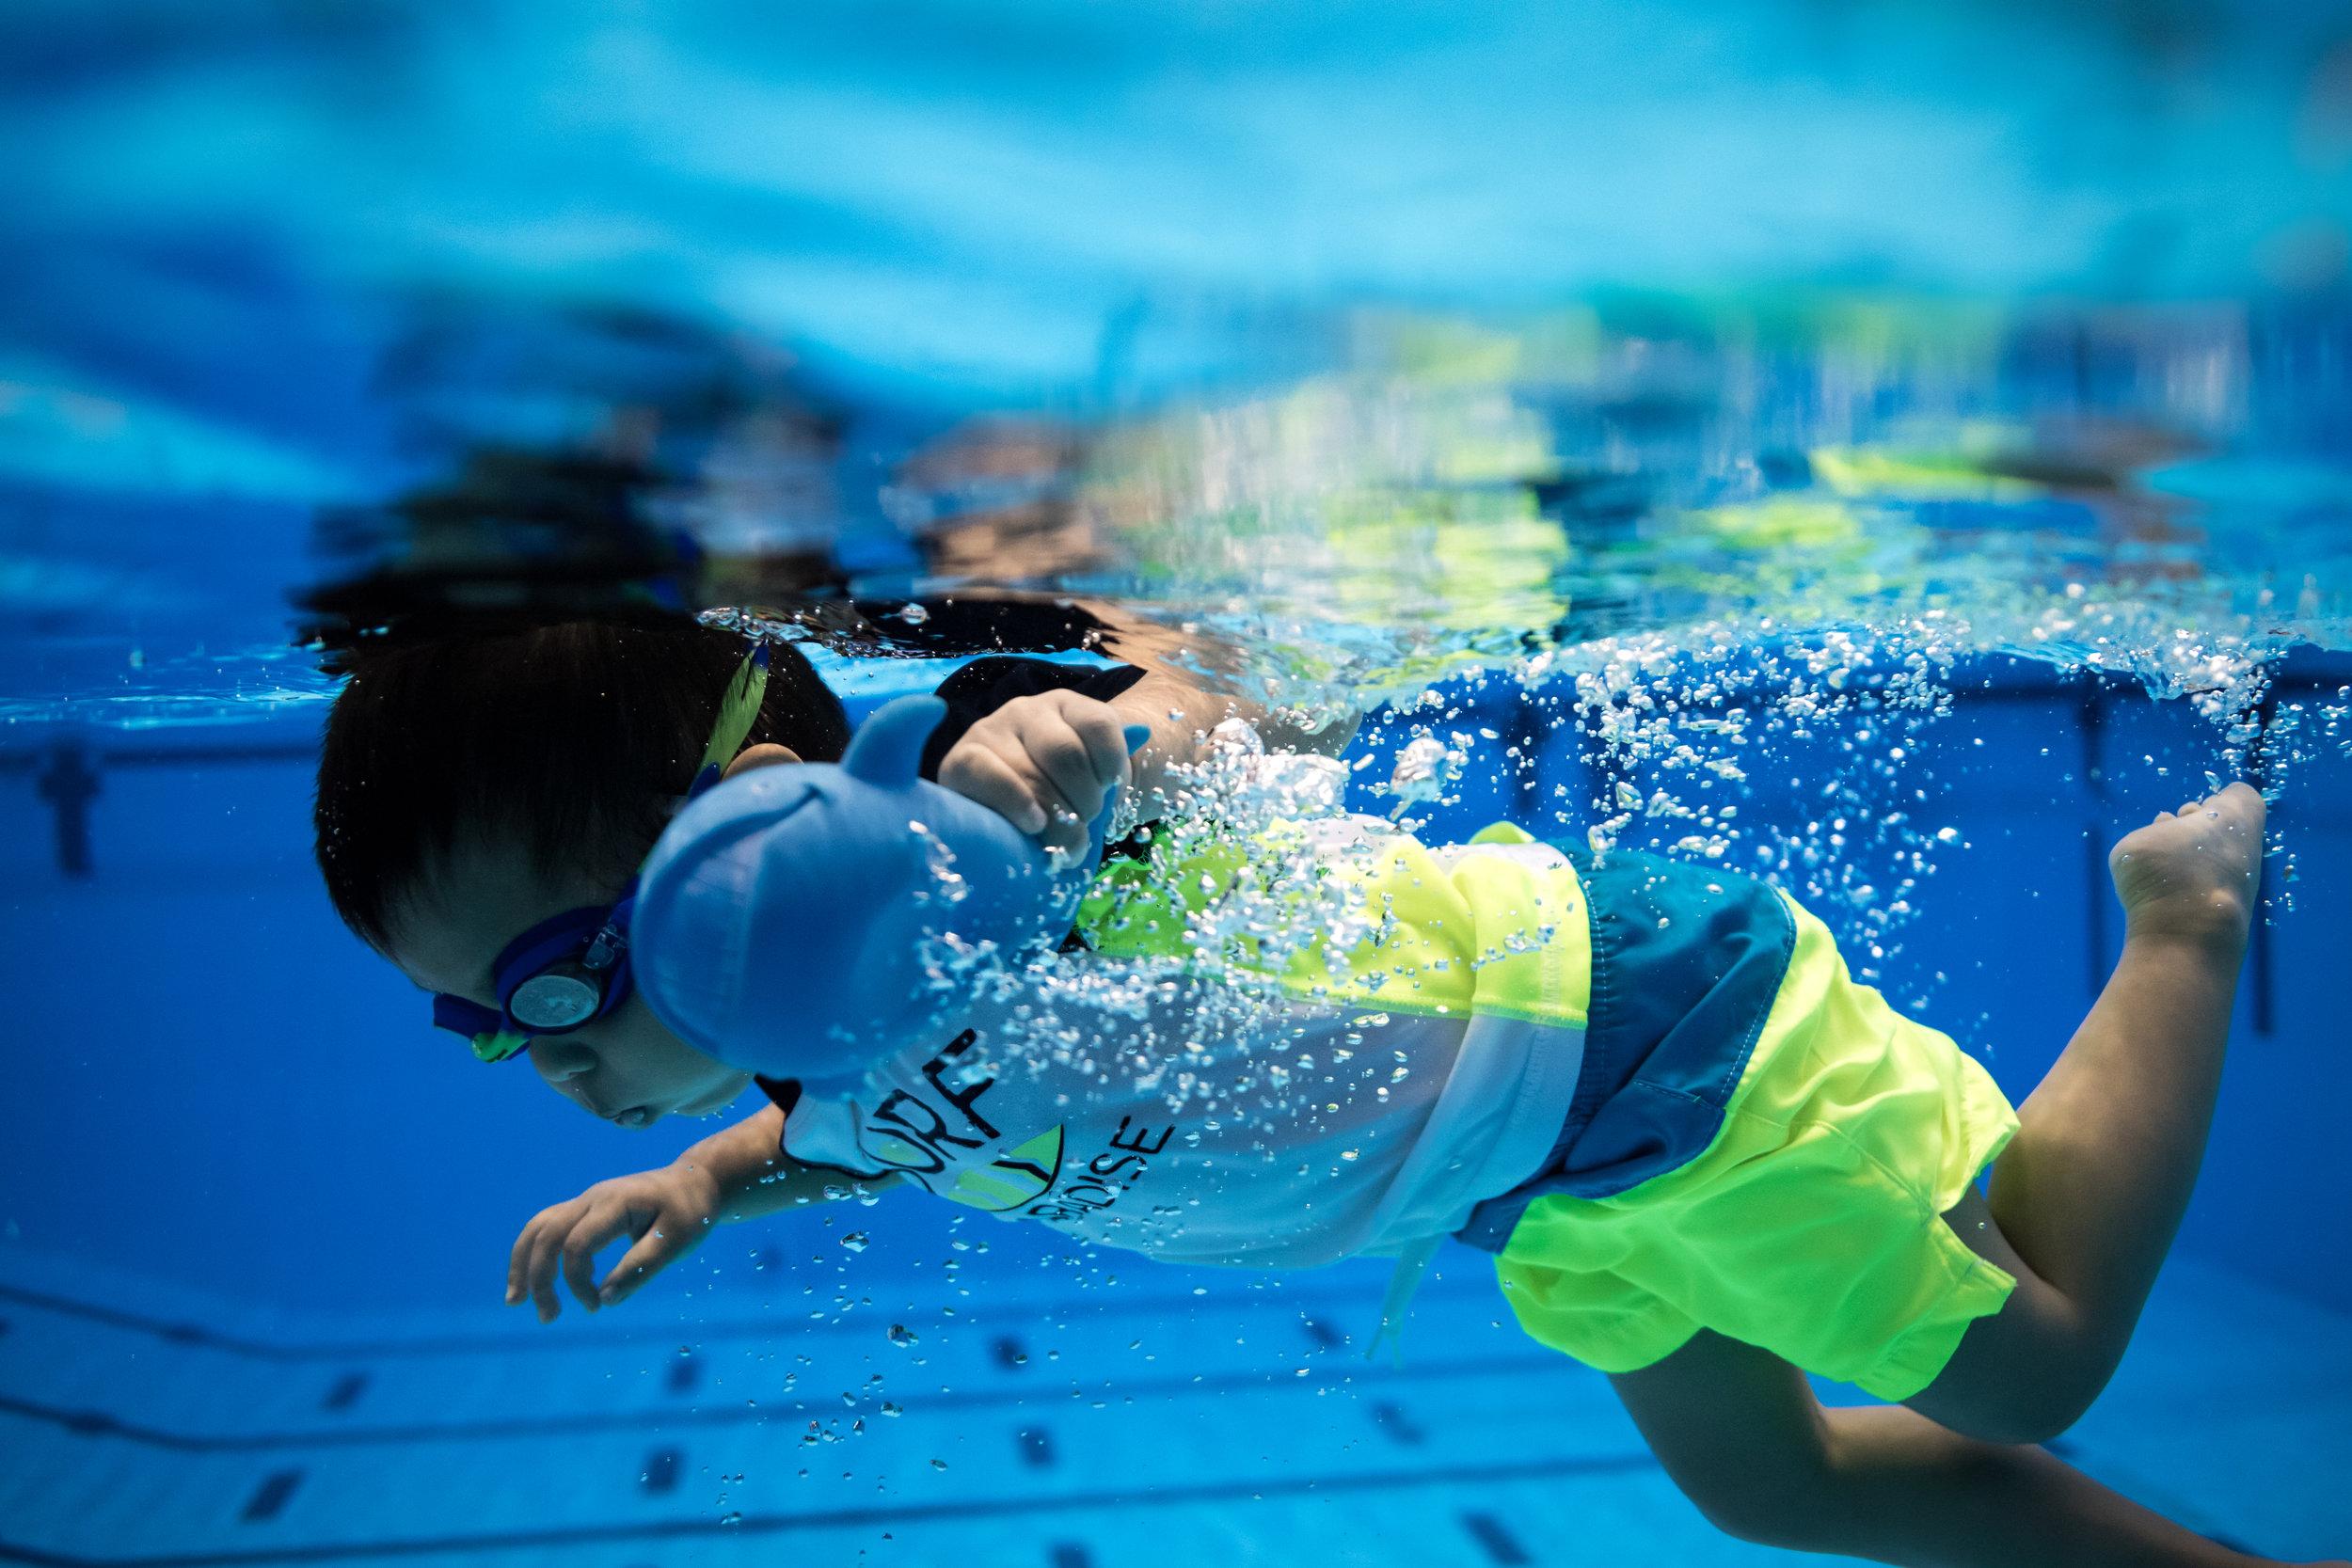 Brady Swimming